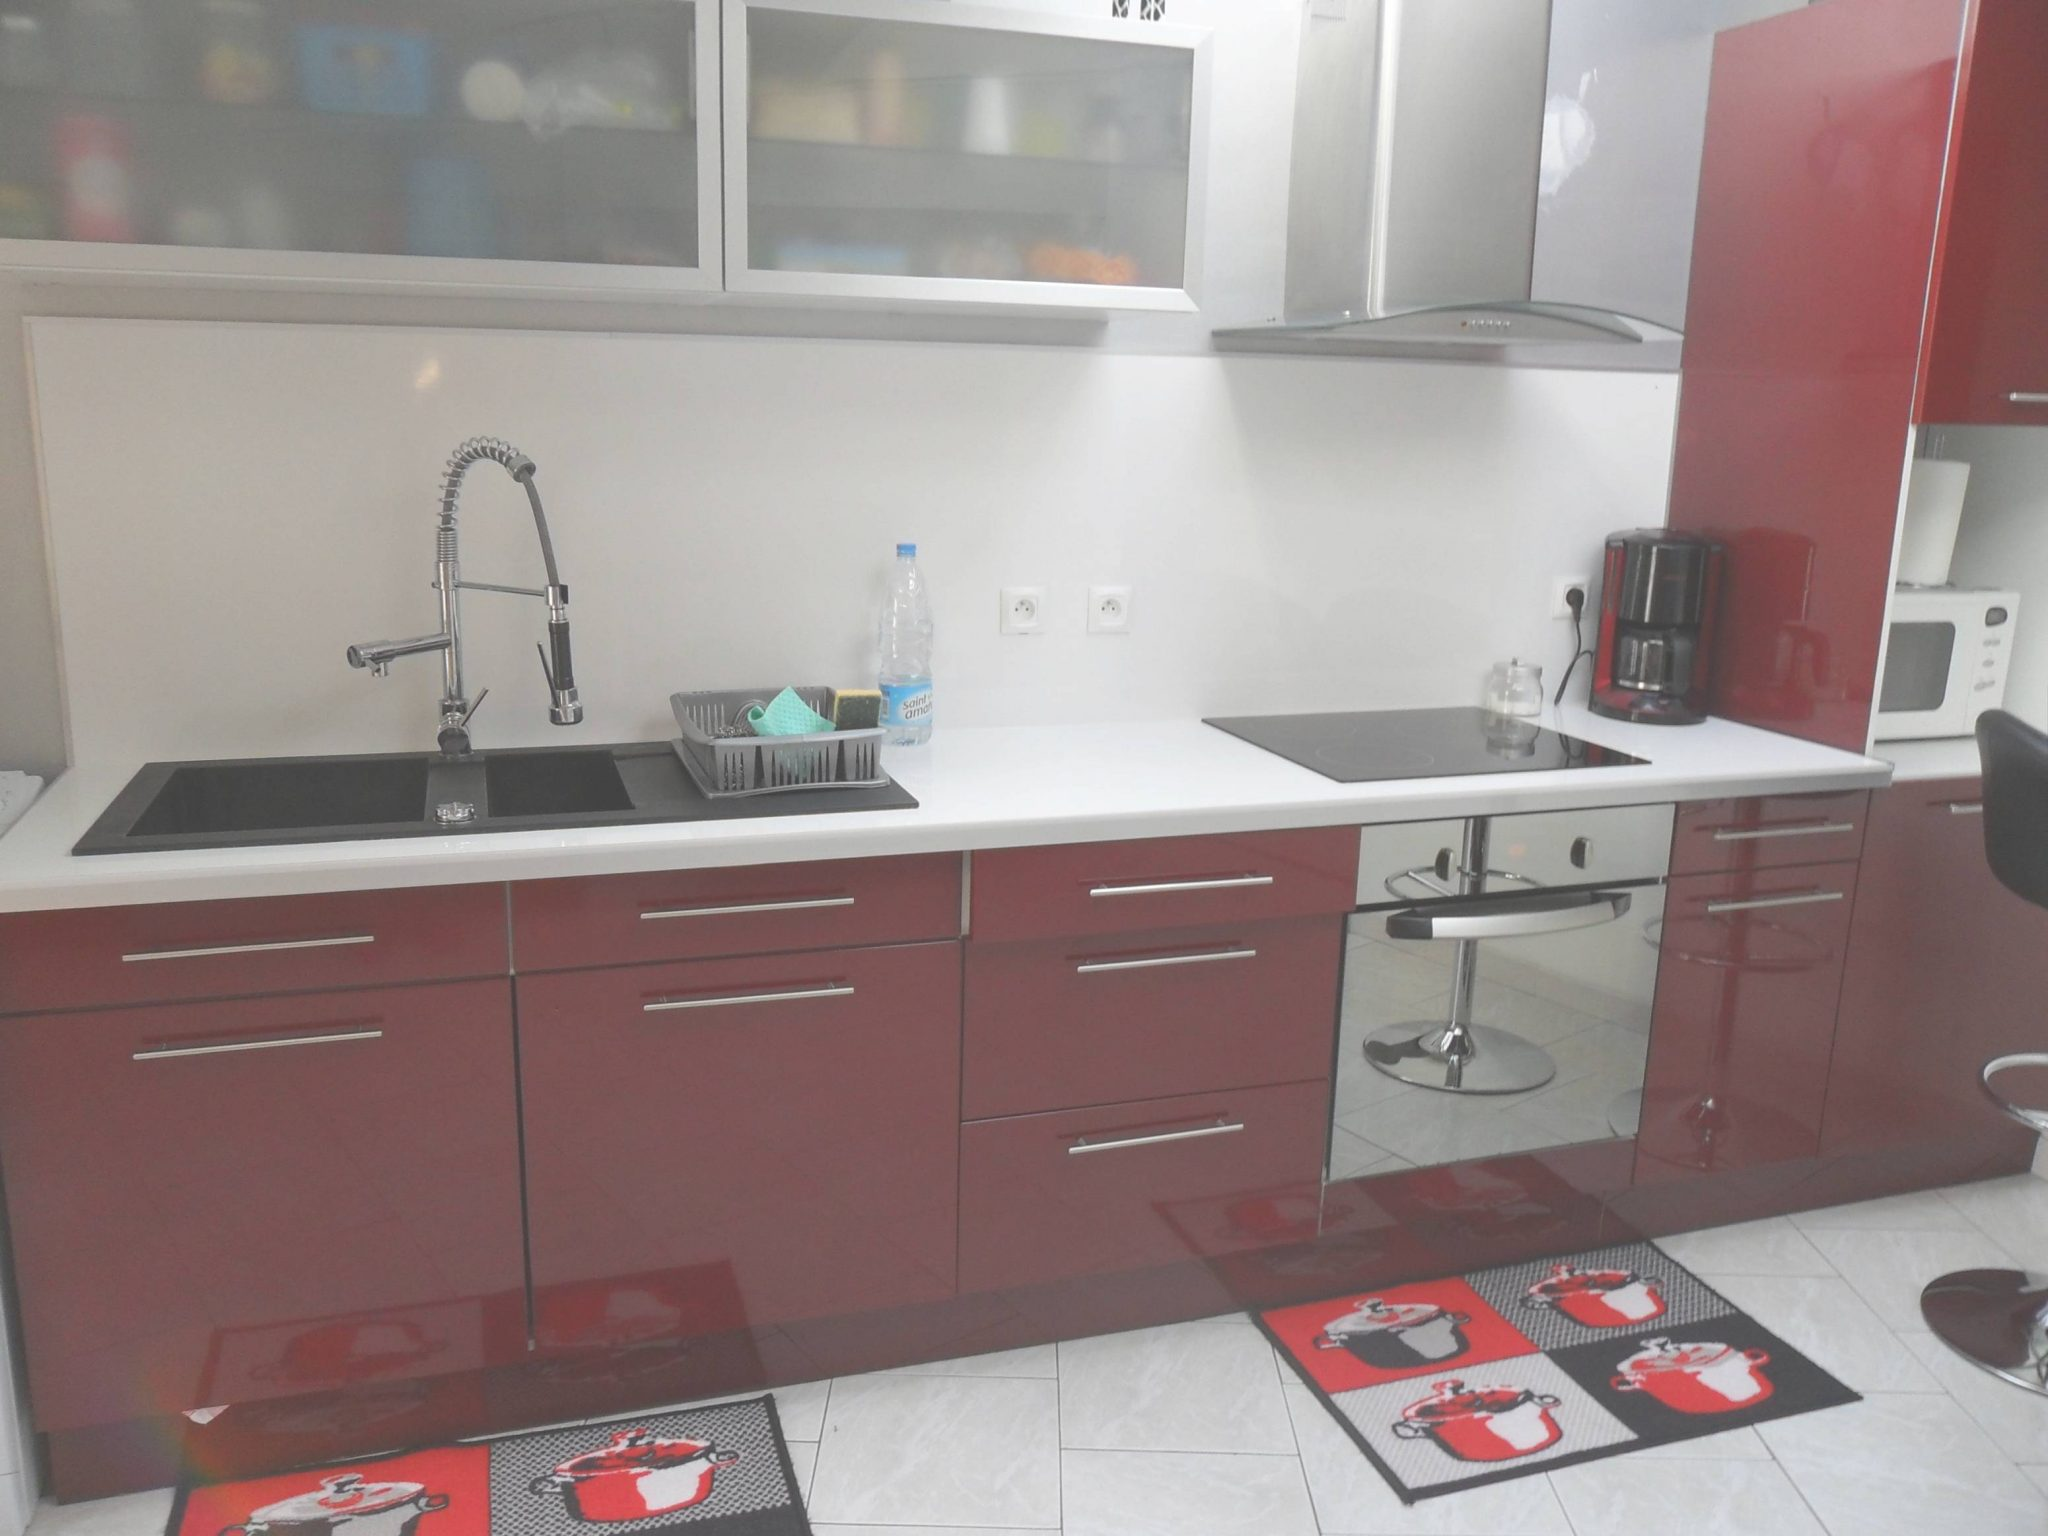 cuisine brico depot modele luna maison et. Black Bedroom Furniture Sets. Home Design Ideas